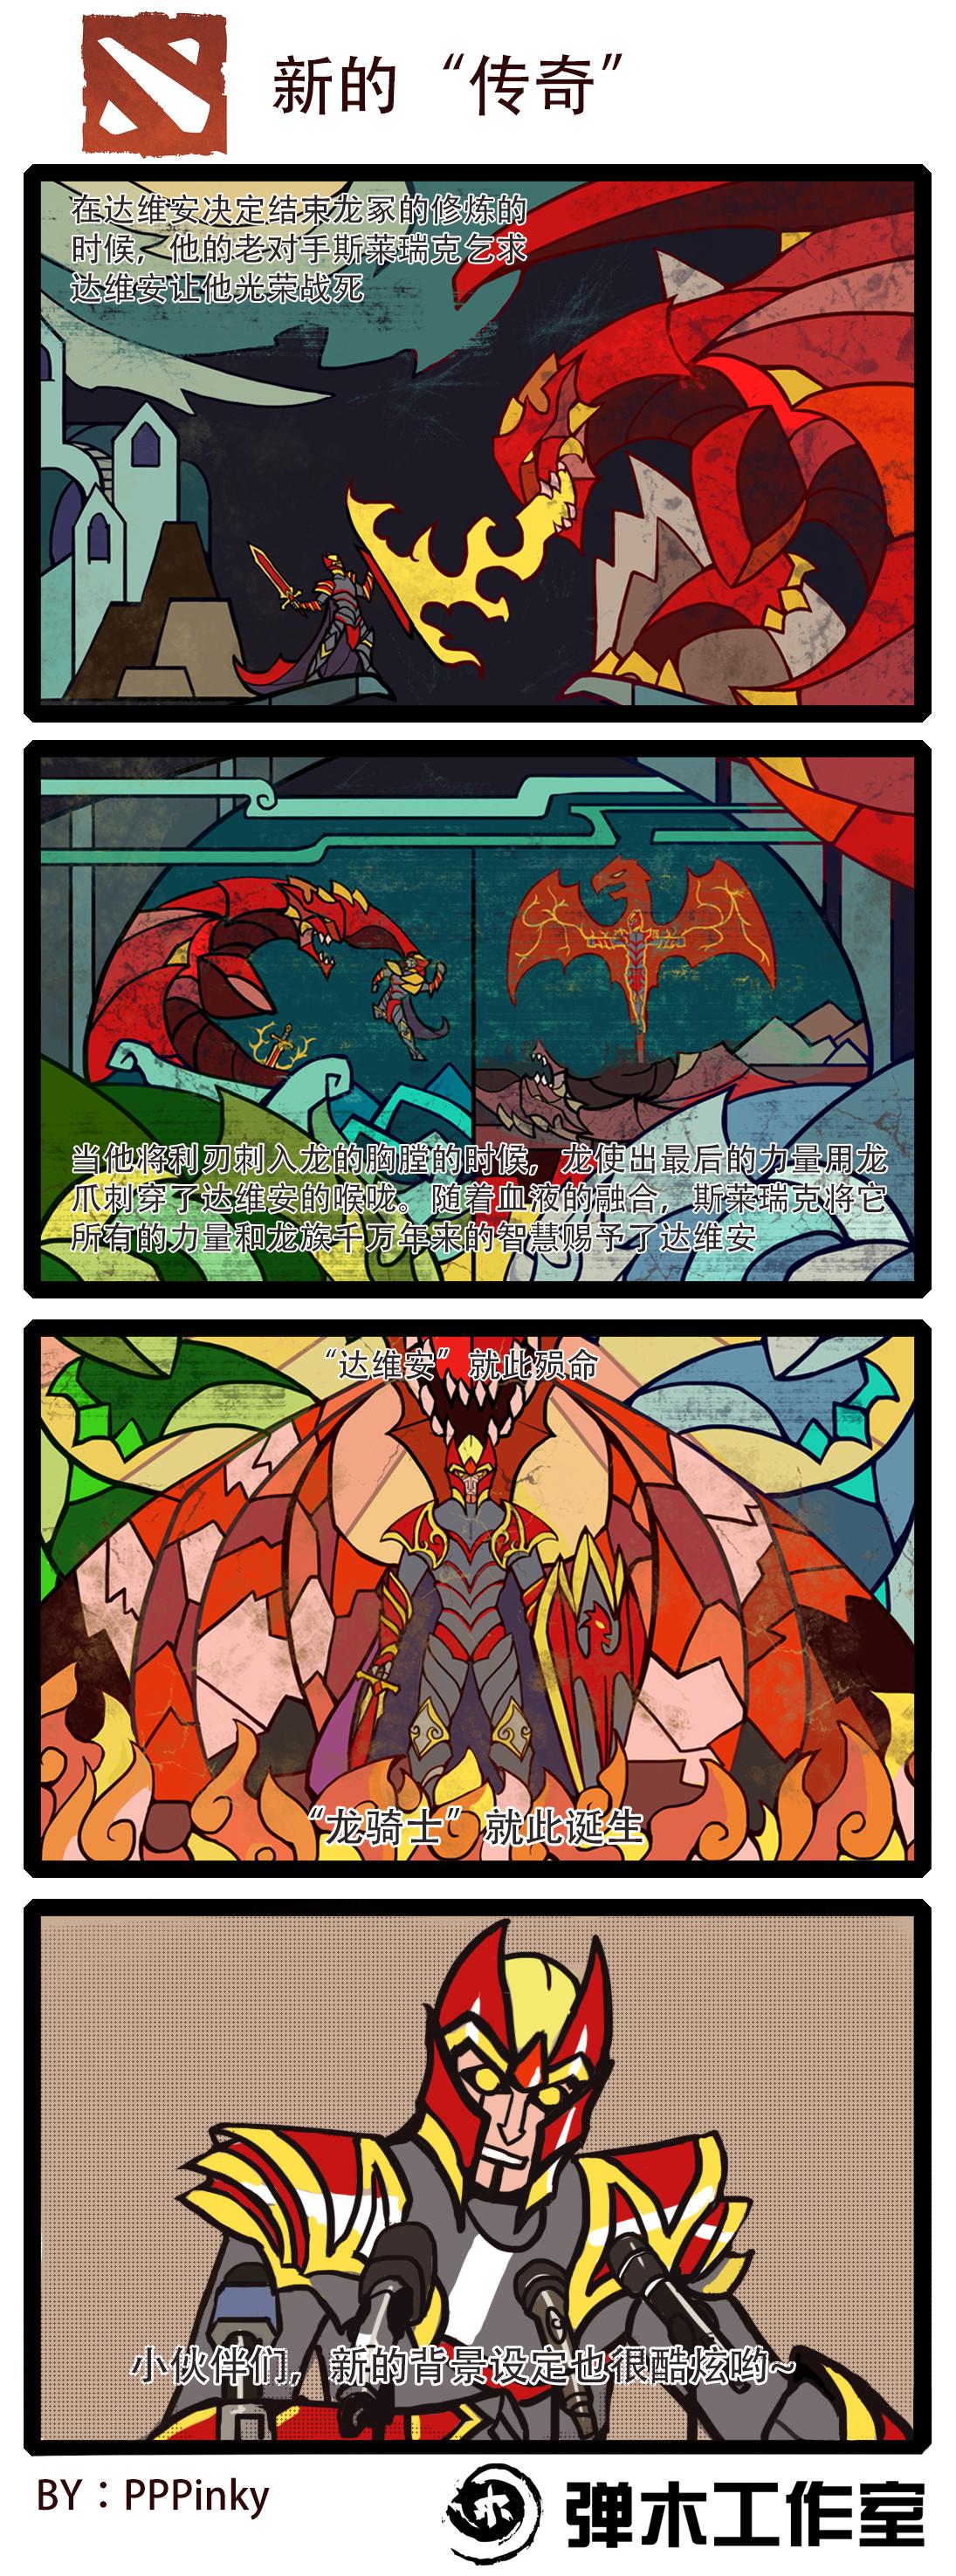 dota2搞笑漫画_传承中的超越 dota2四格漫画爆笑进化史